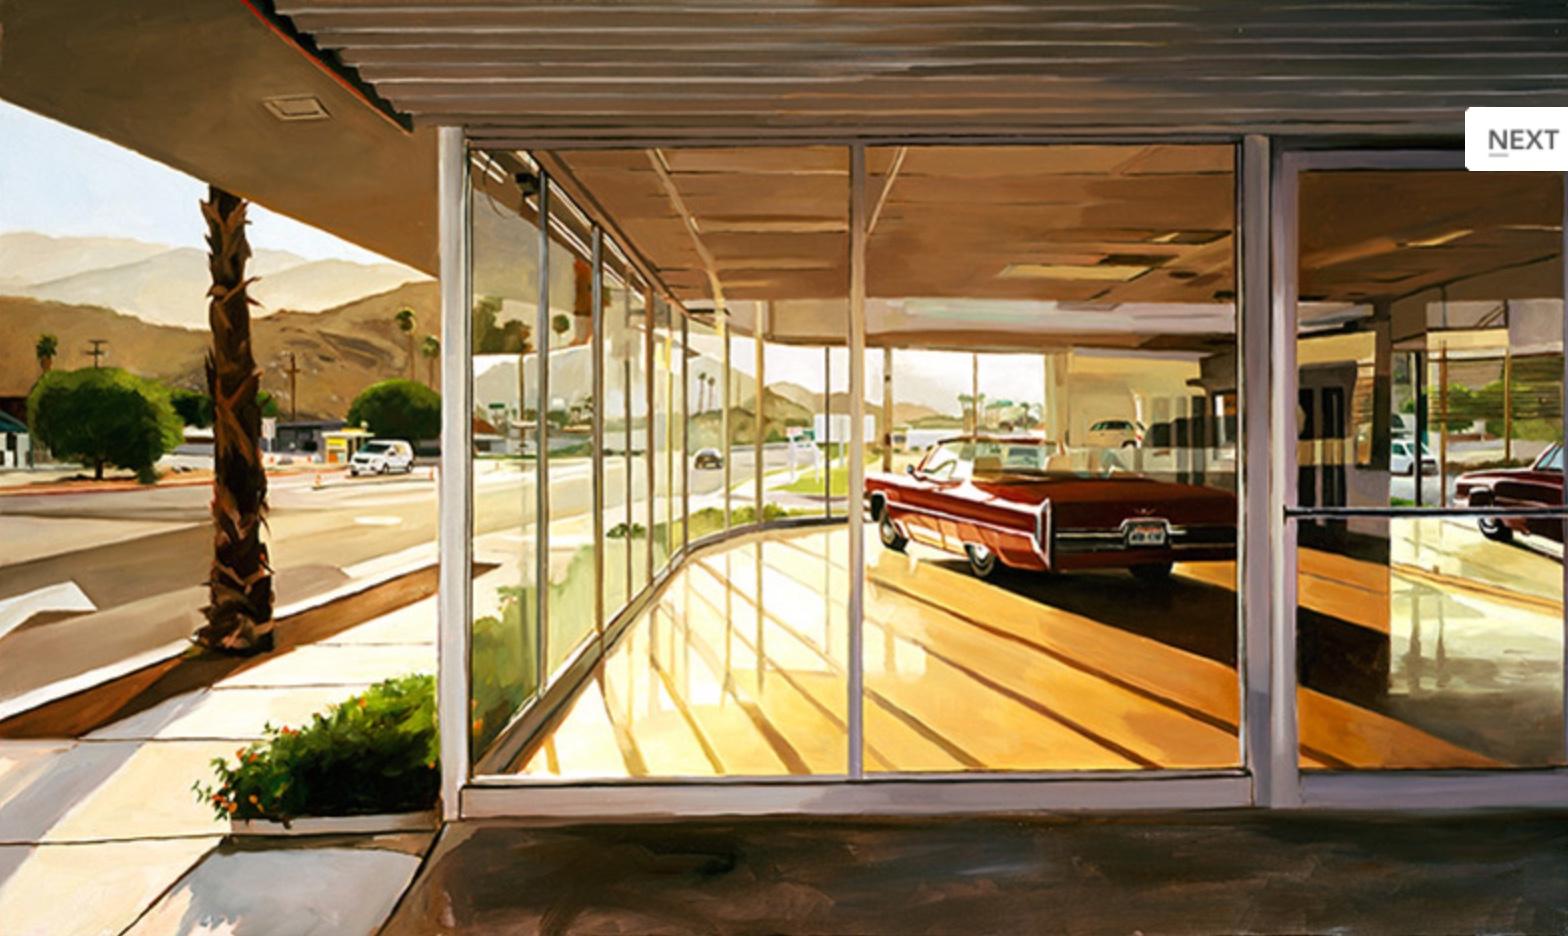 Palm Springs Showroom, 24x30 (2008)